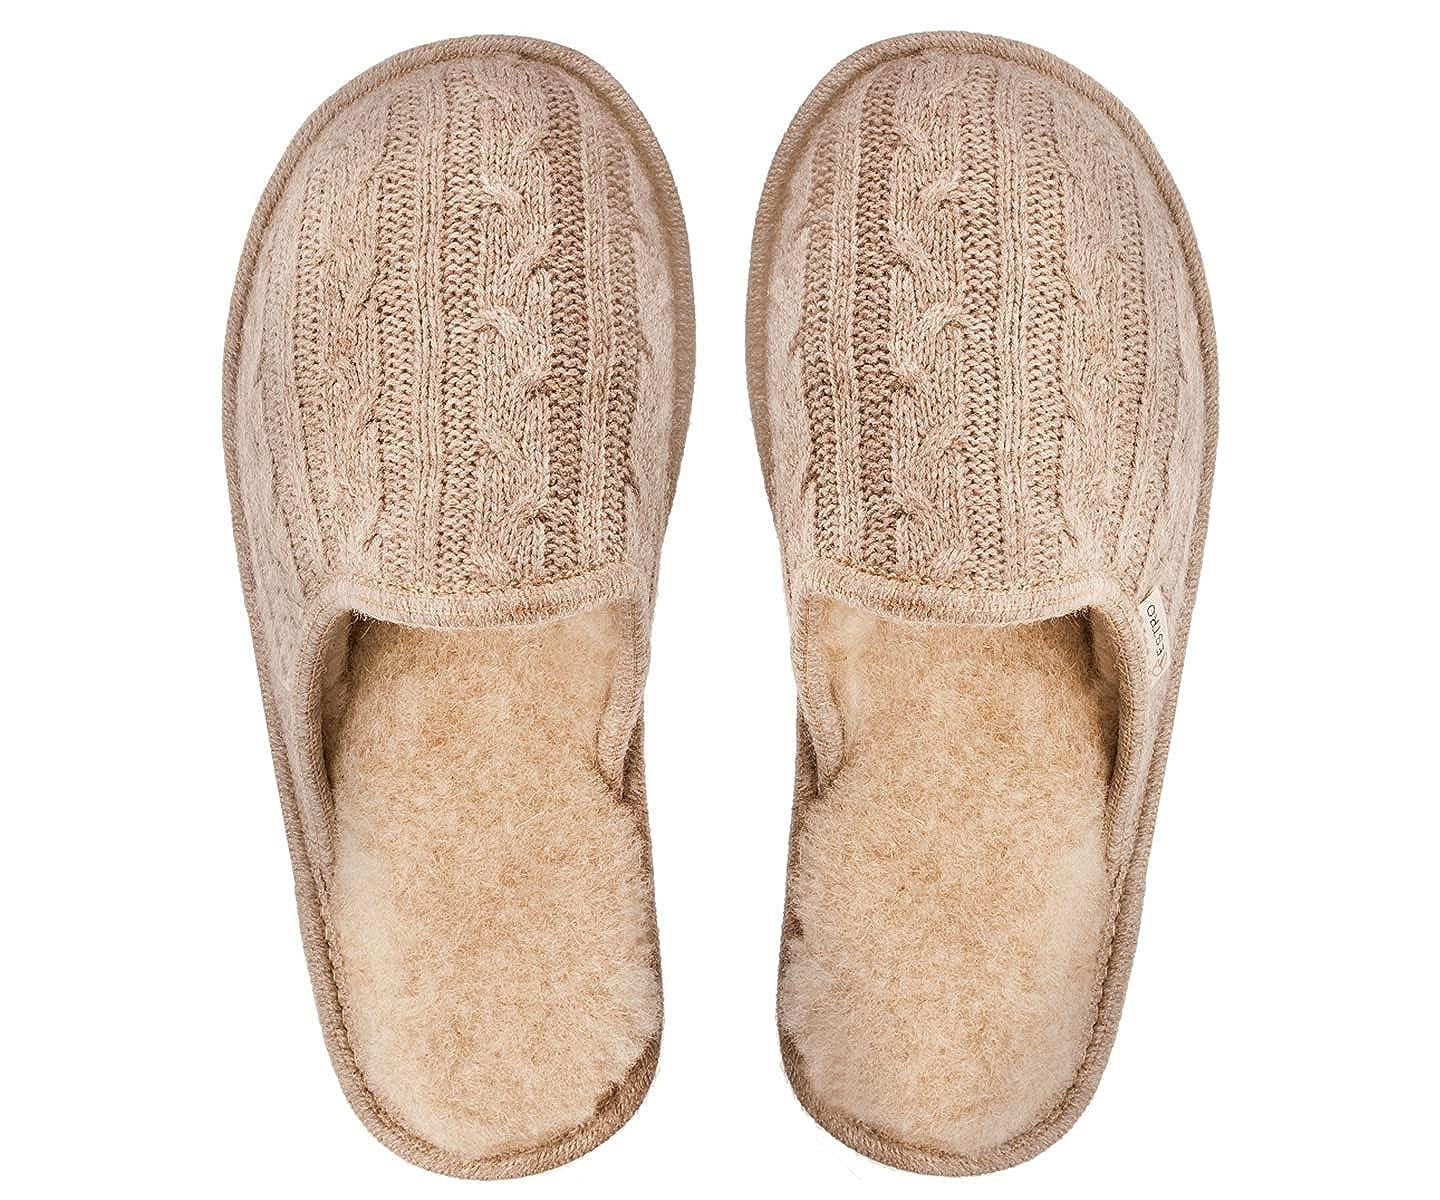 finest selection 7afba b2626 ESTRO Pantofole Donna Ciabatte Lana Donna Casa Pantofola ...